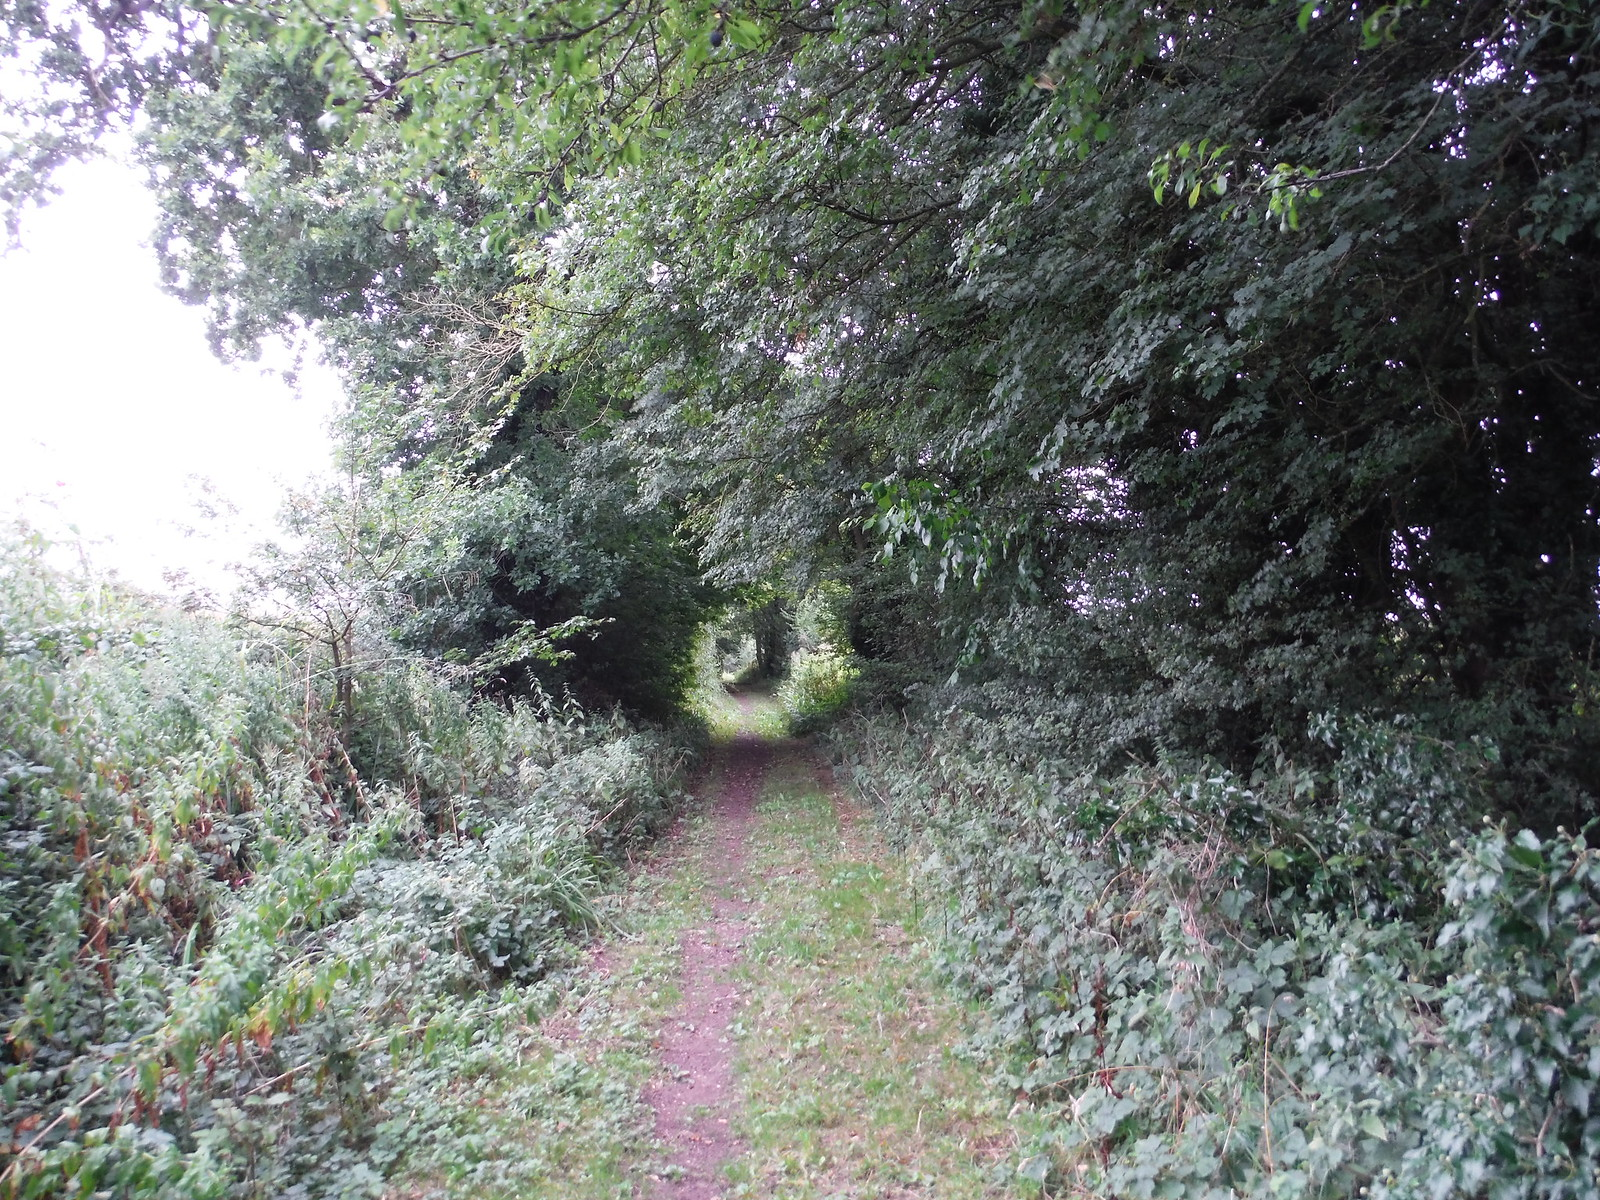 Chandler's Lane SWC Walk 164 Roydon to Sawbridgeworth via Henry Moore Foundation